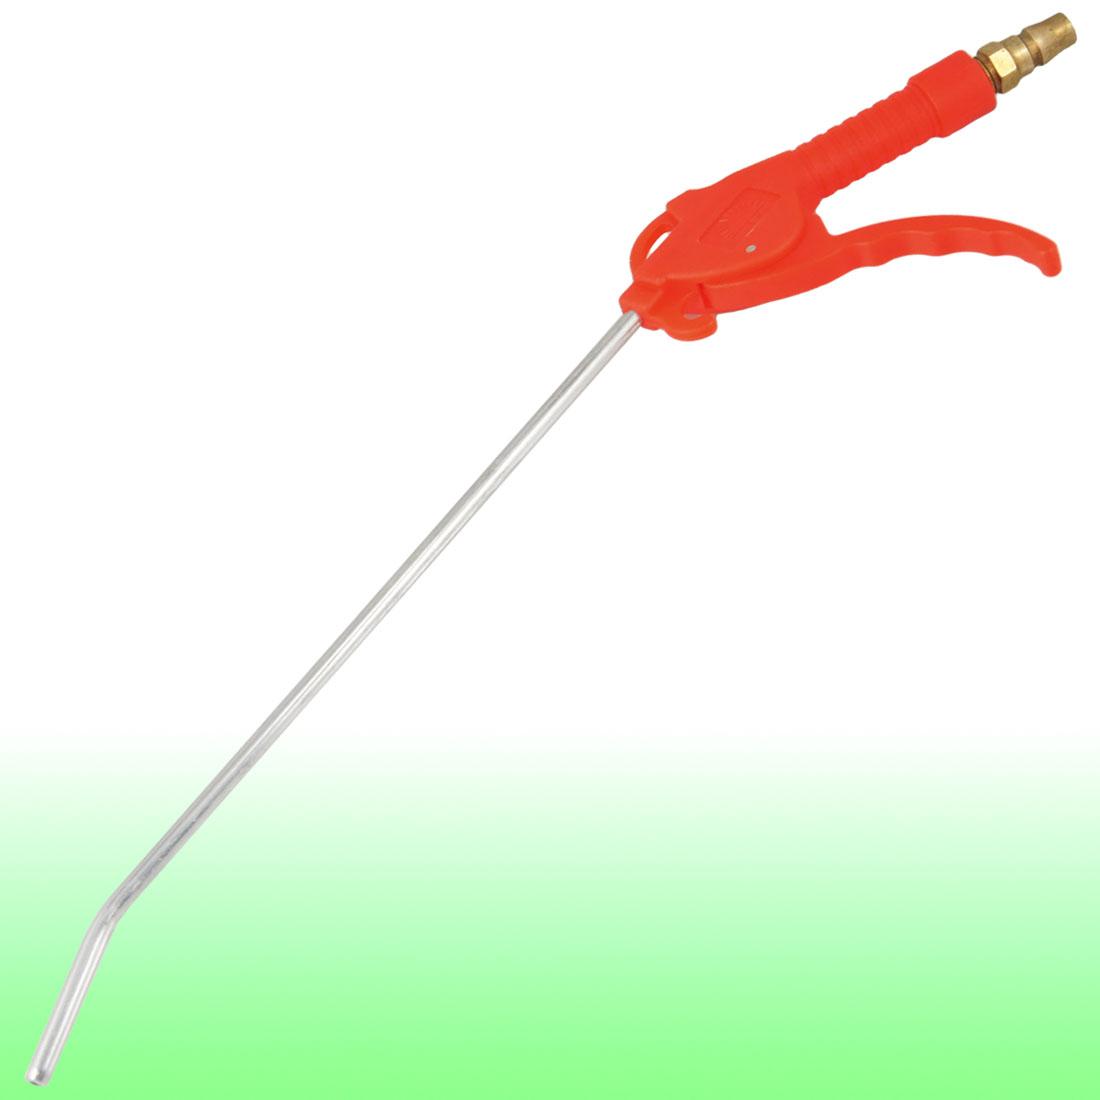 "1/2"" Hose Dia Plastic Handle Air Blower Blow Gun Cleaning Tool Red"